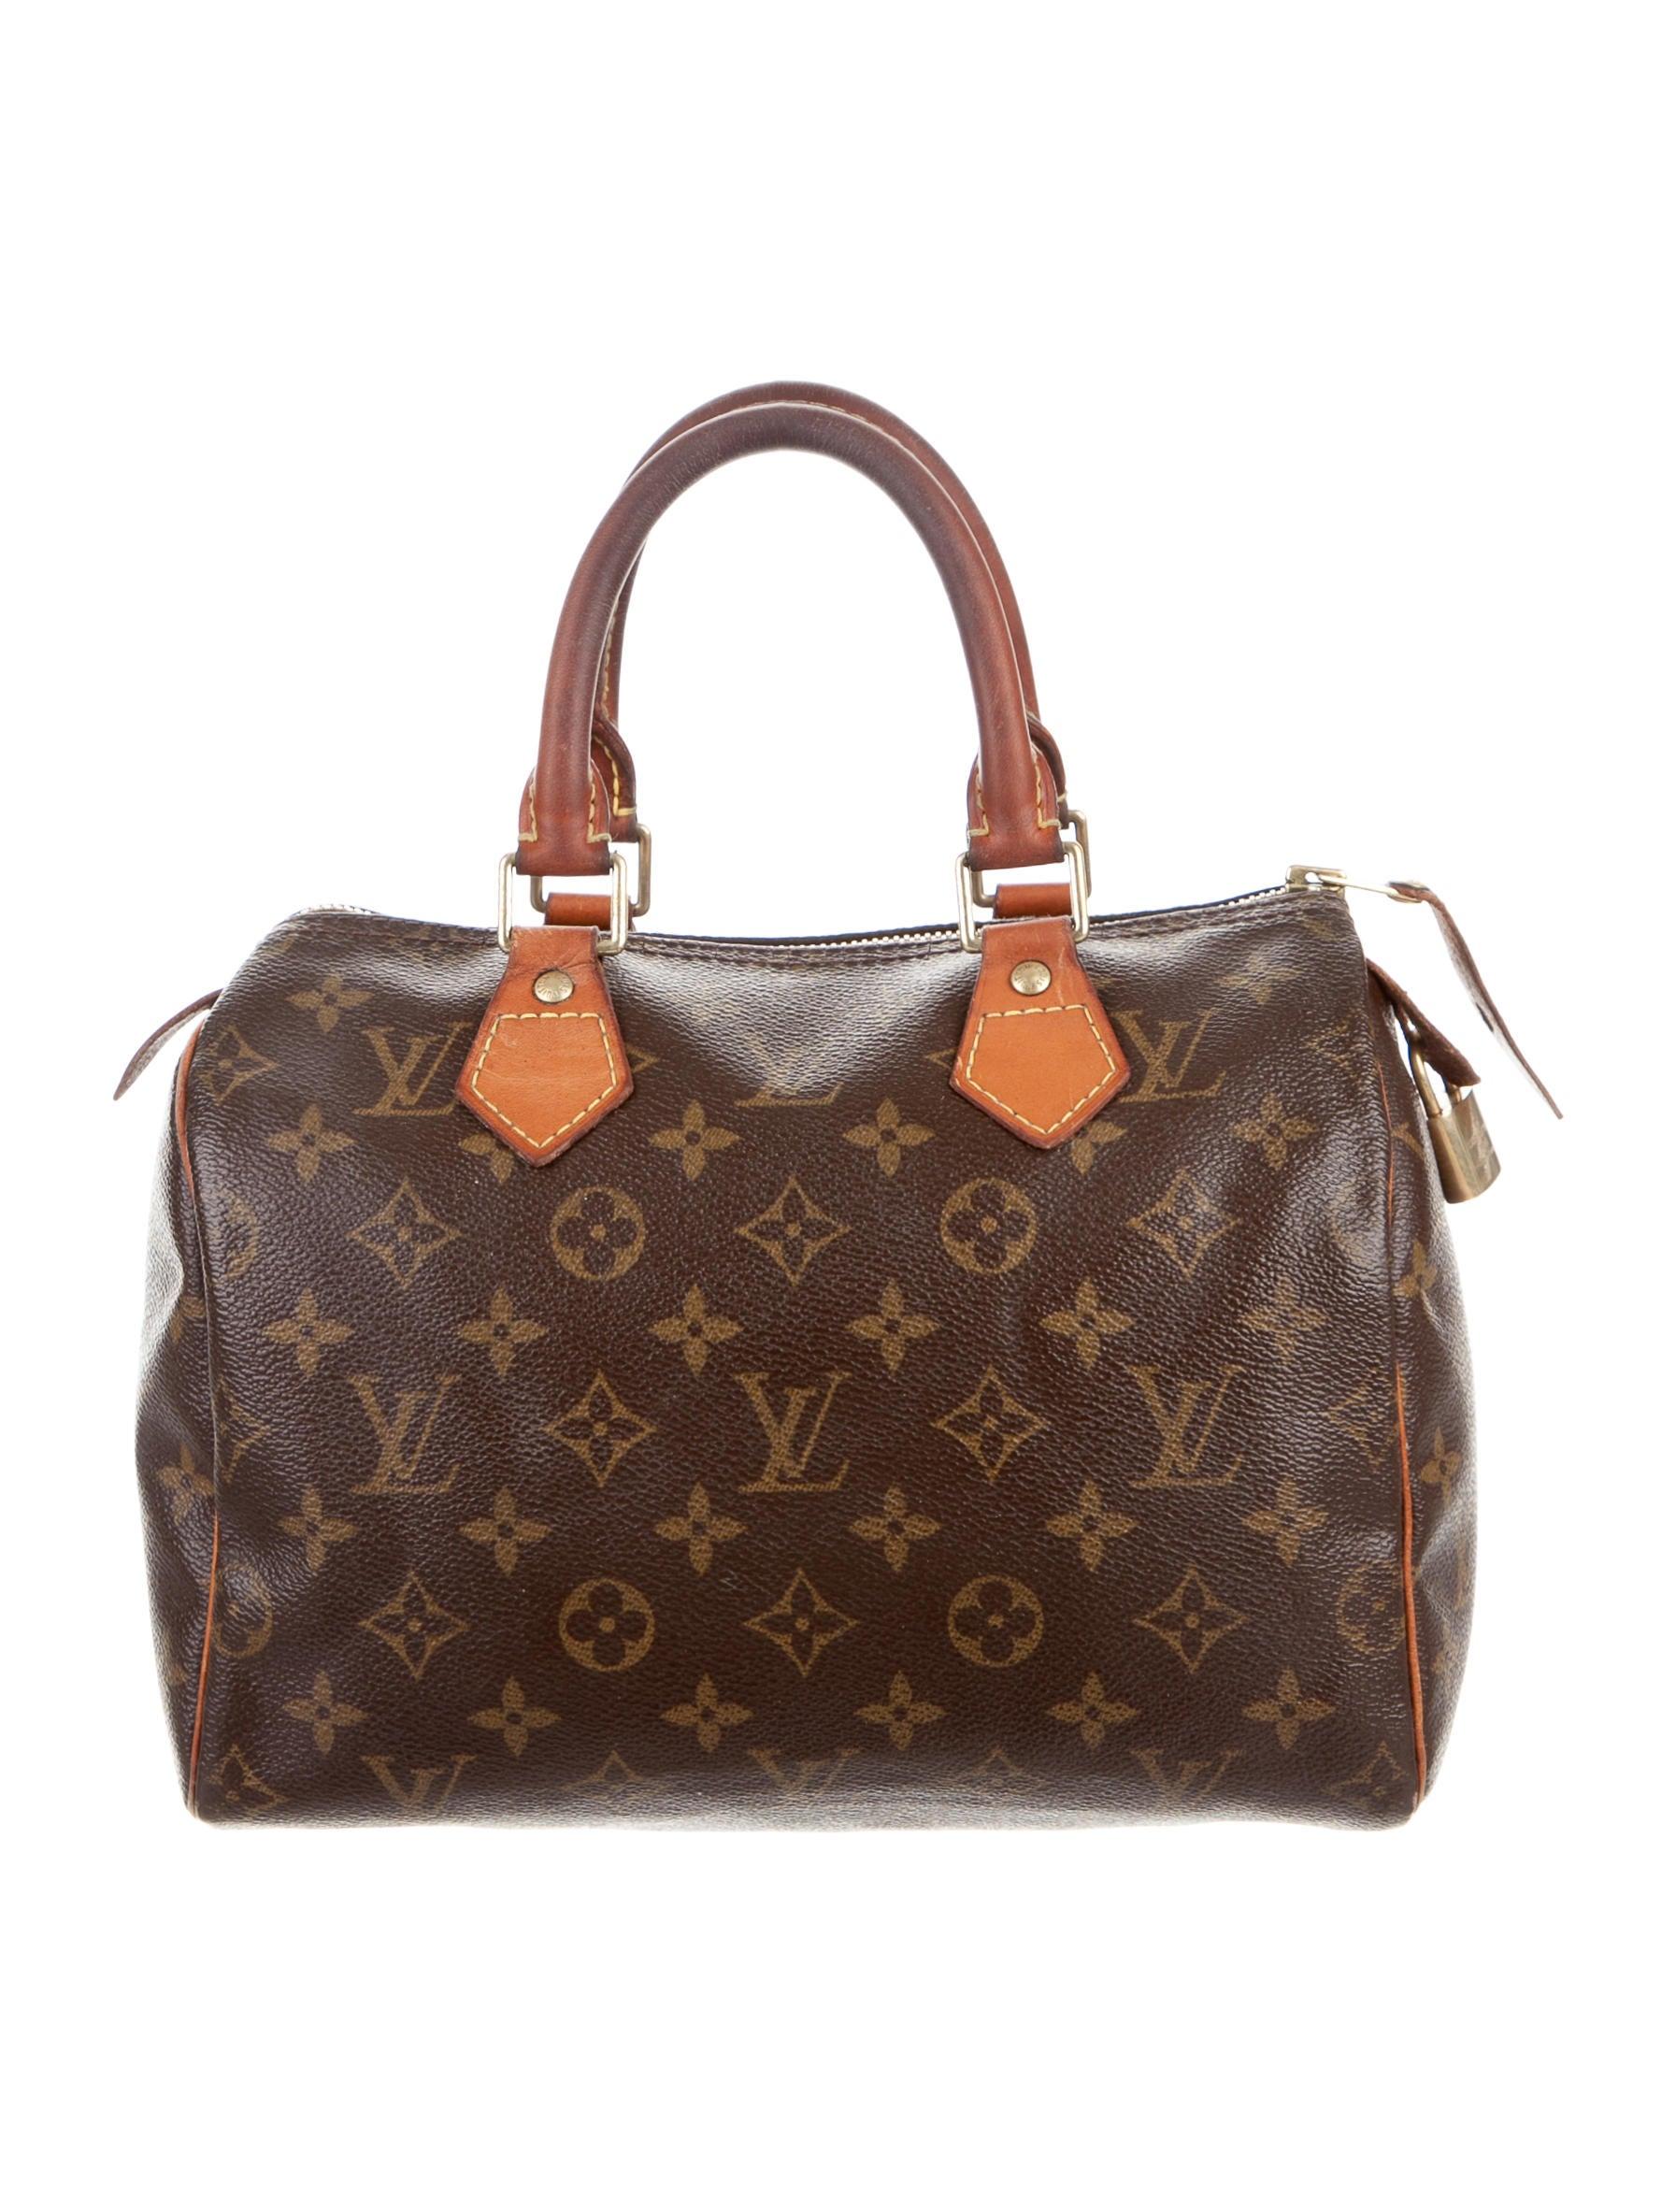 louis vuitton monogram speedy 25 handbags lou106214. Black Bedroom Furniture Sets. Home Design Ideas